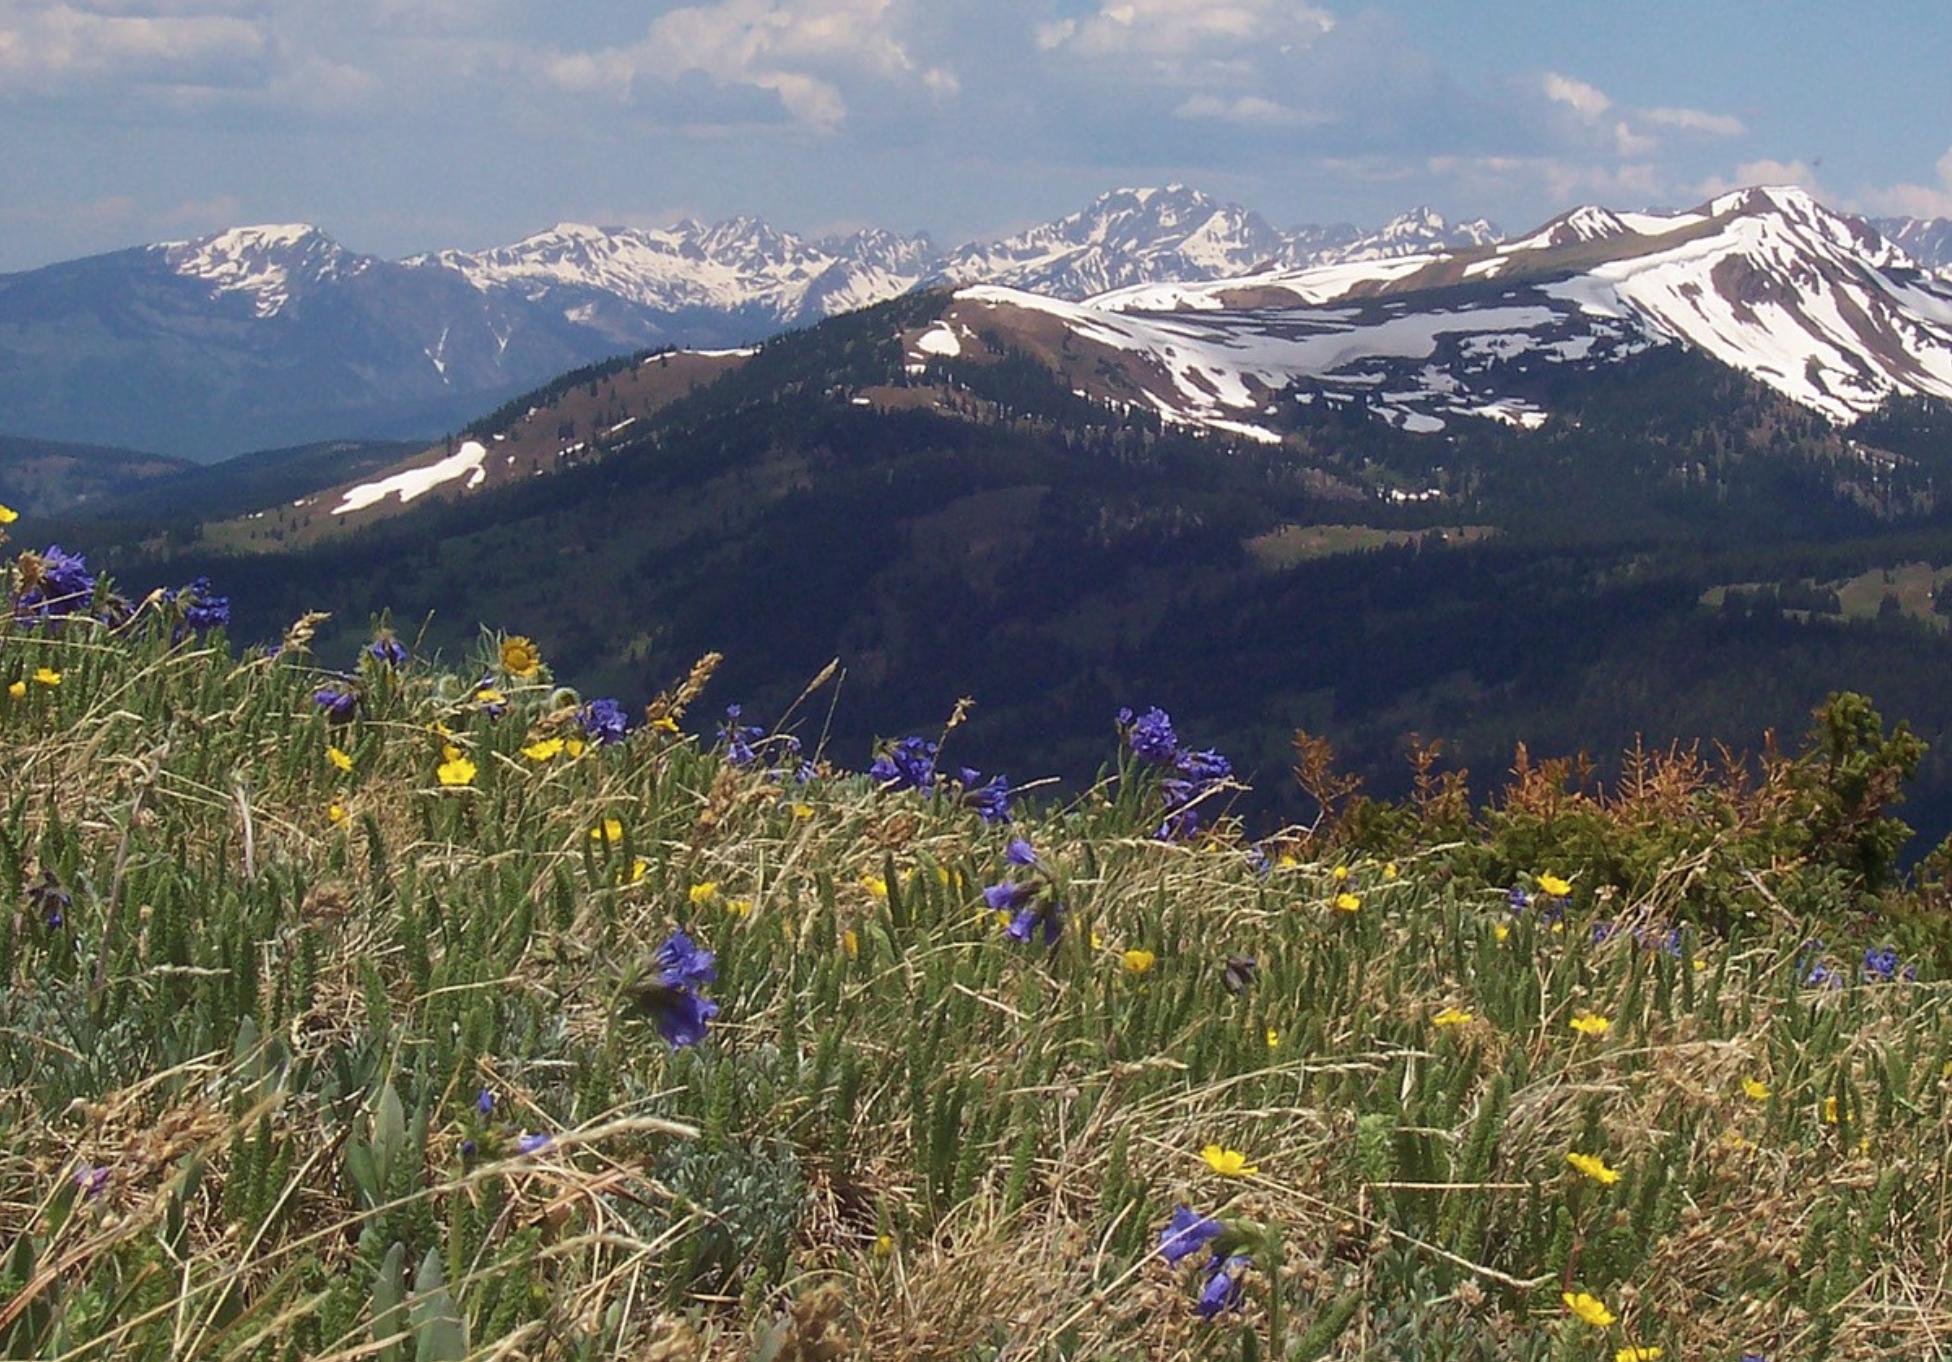 AMF alpine meadow plants growing above ECM trees .